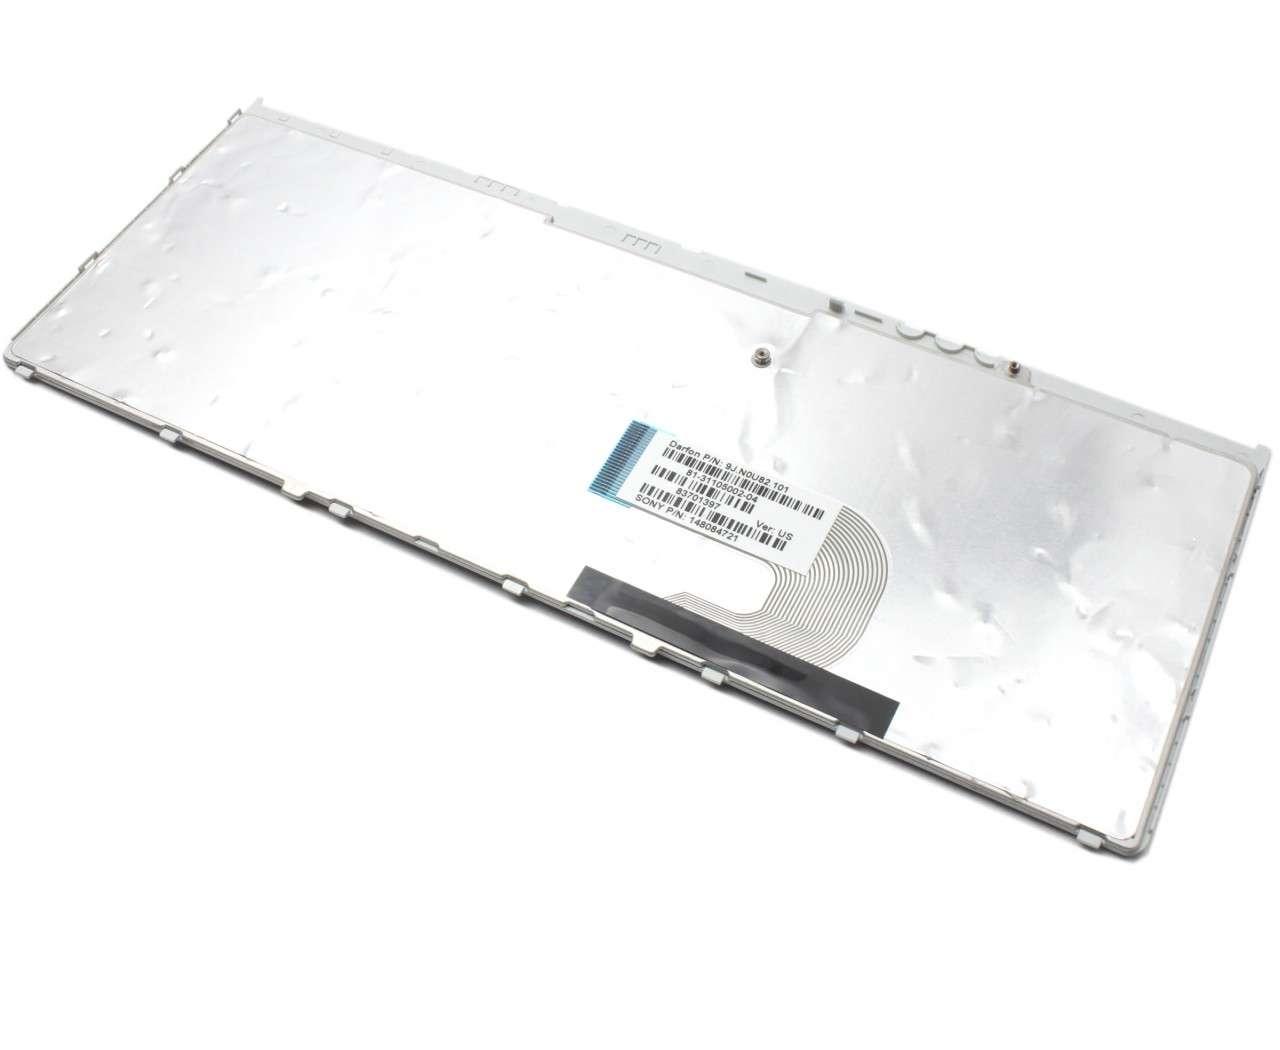 Tastatura Sony Vaio VGN-FW21Z neagra cu rama gri imagine powerlaptop.ro 2021